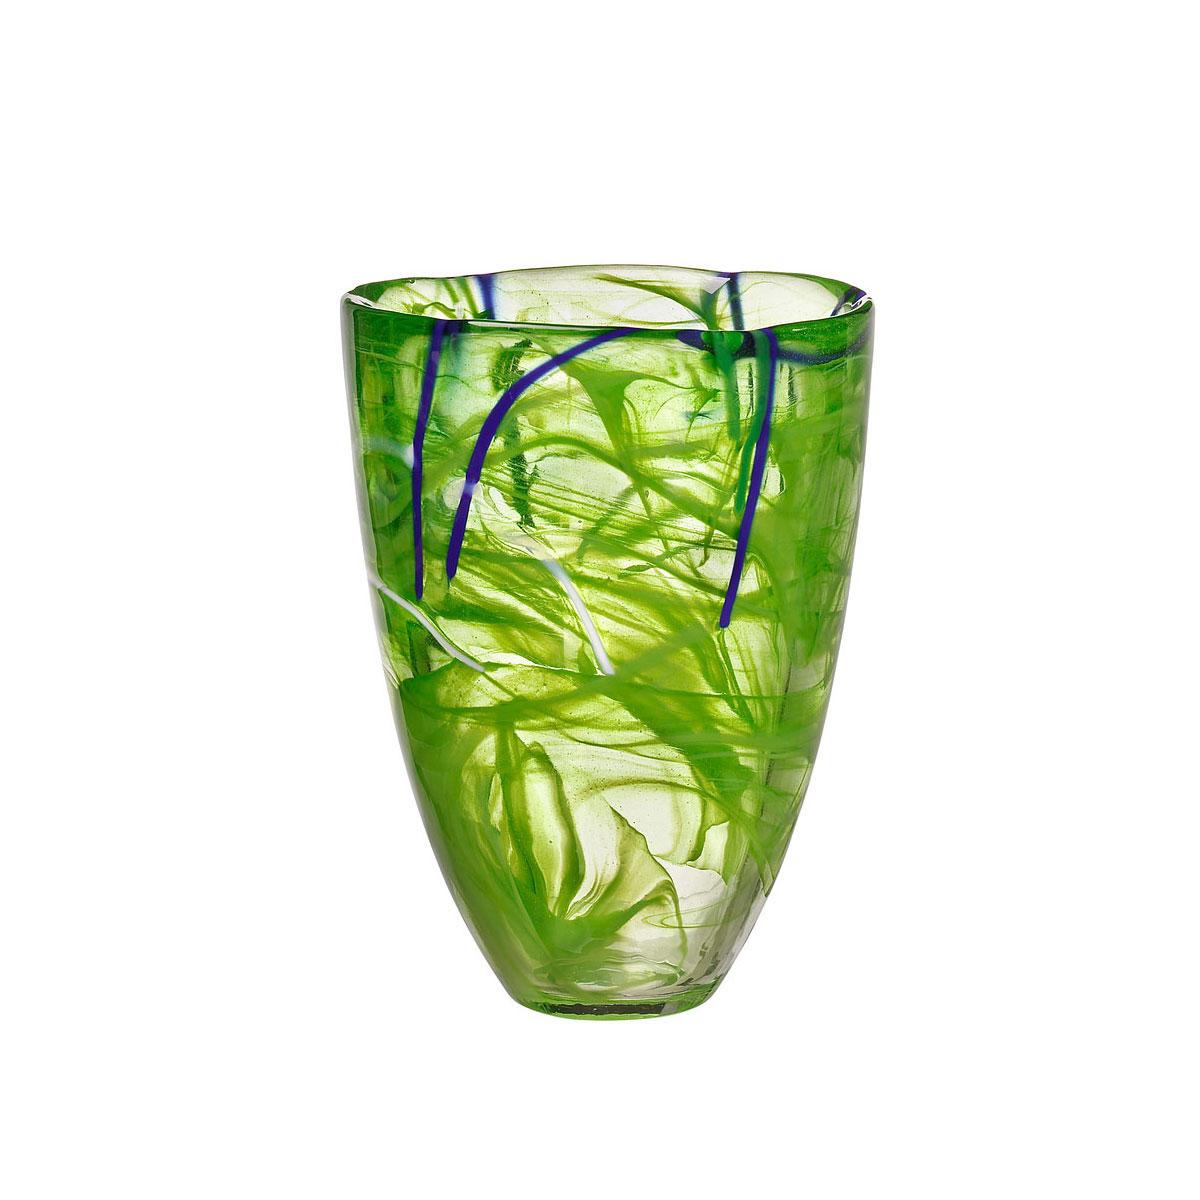 Kosta Boda Contrast Crystal Vase, Lime